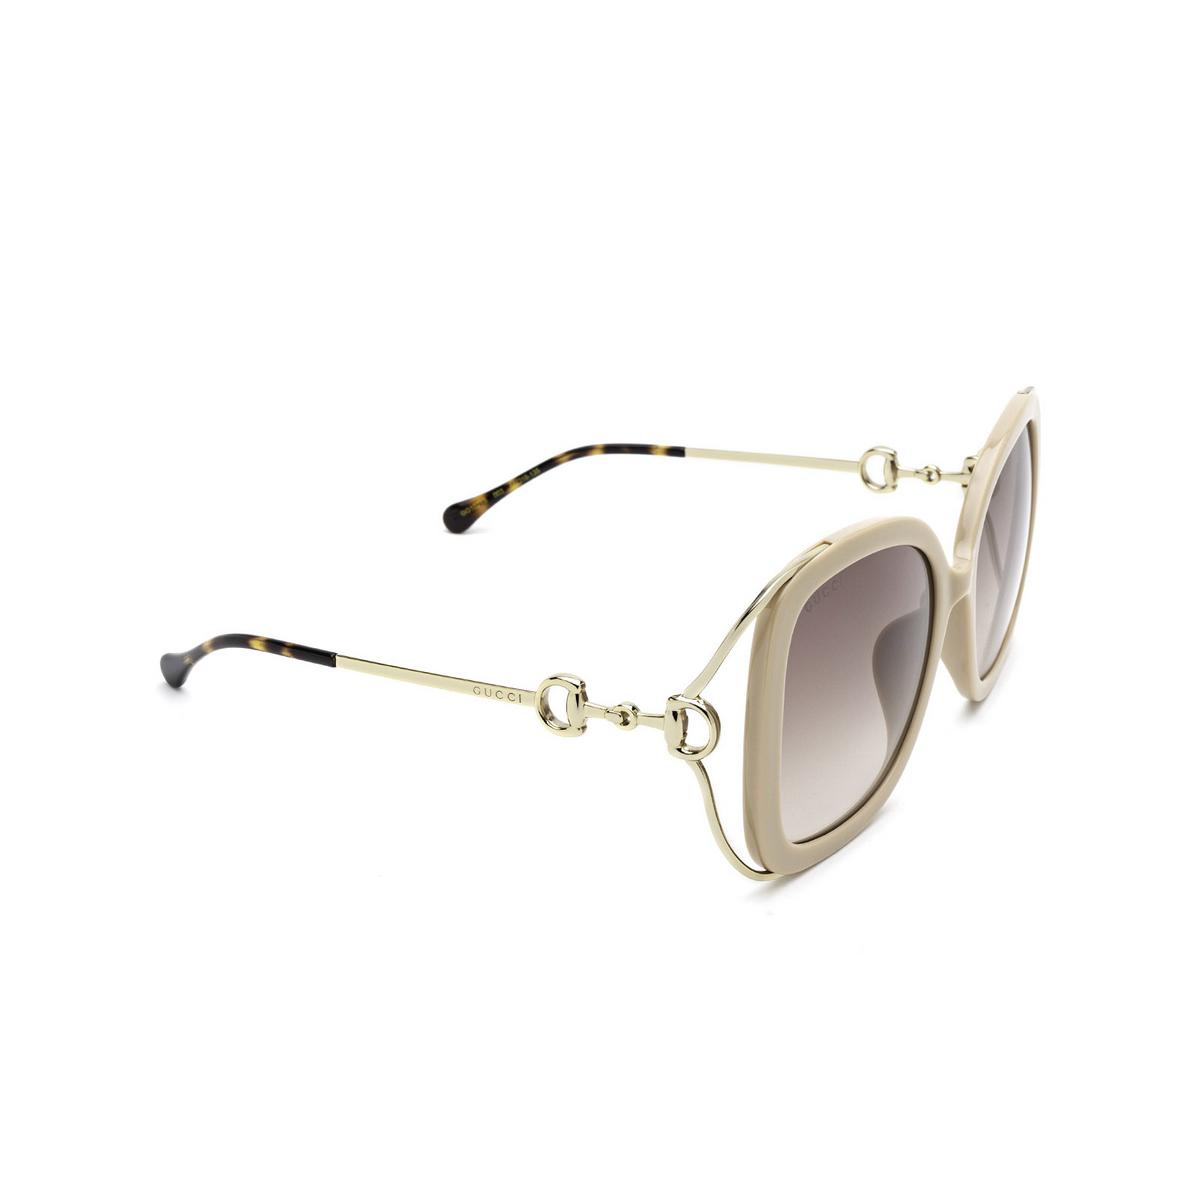 Gucci® Square Sunglasses: GG1021S color Ivory 003 - three-quarters view.